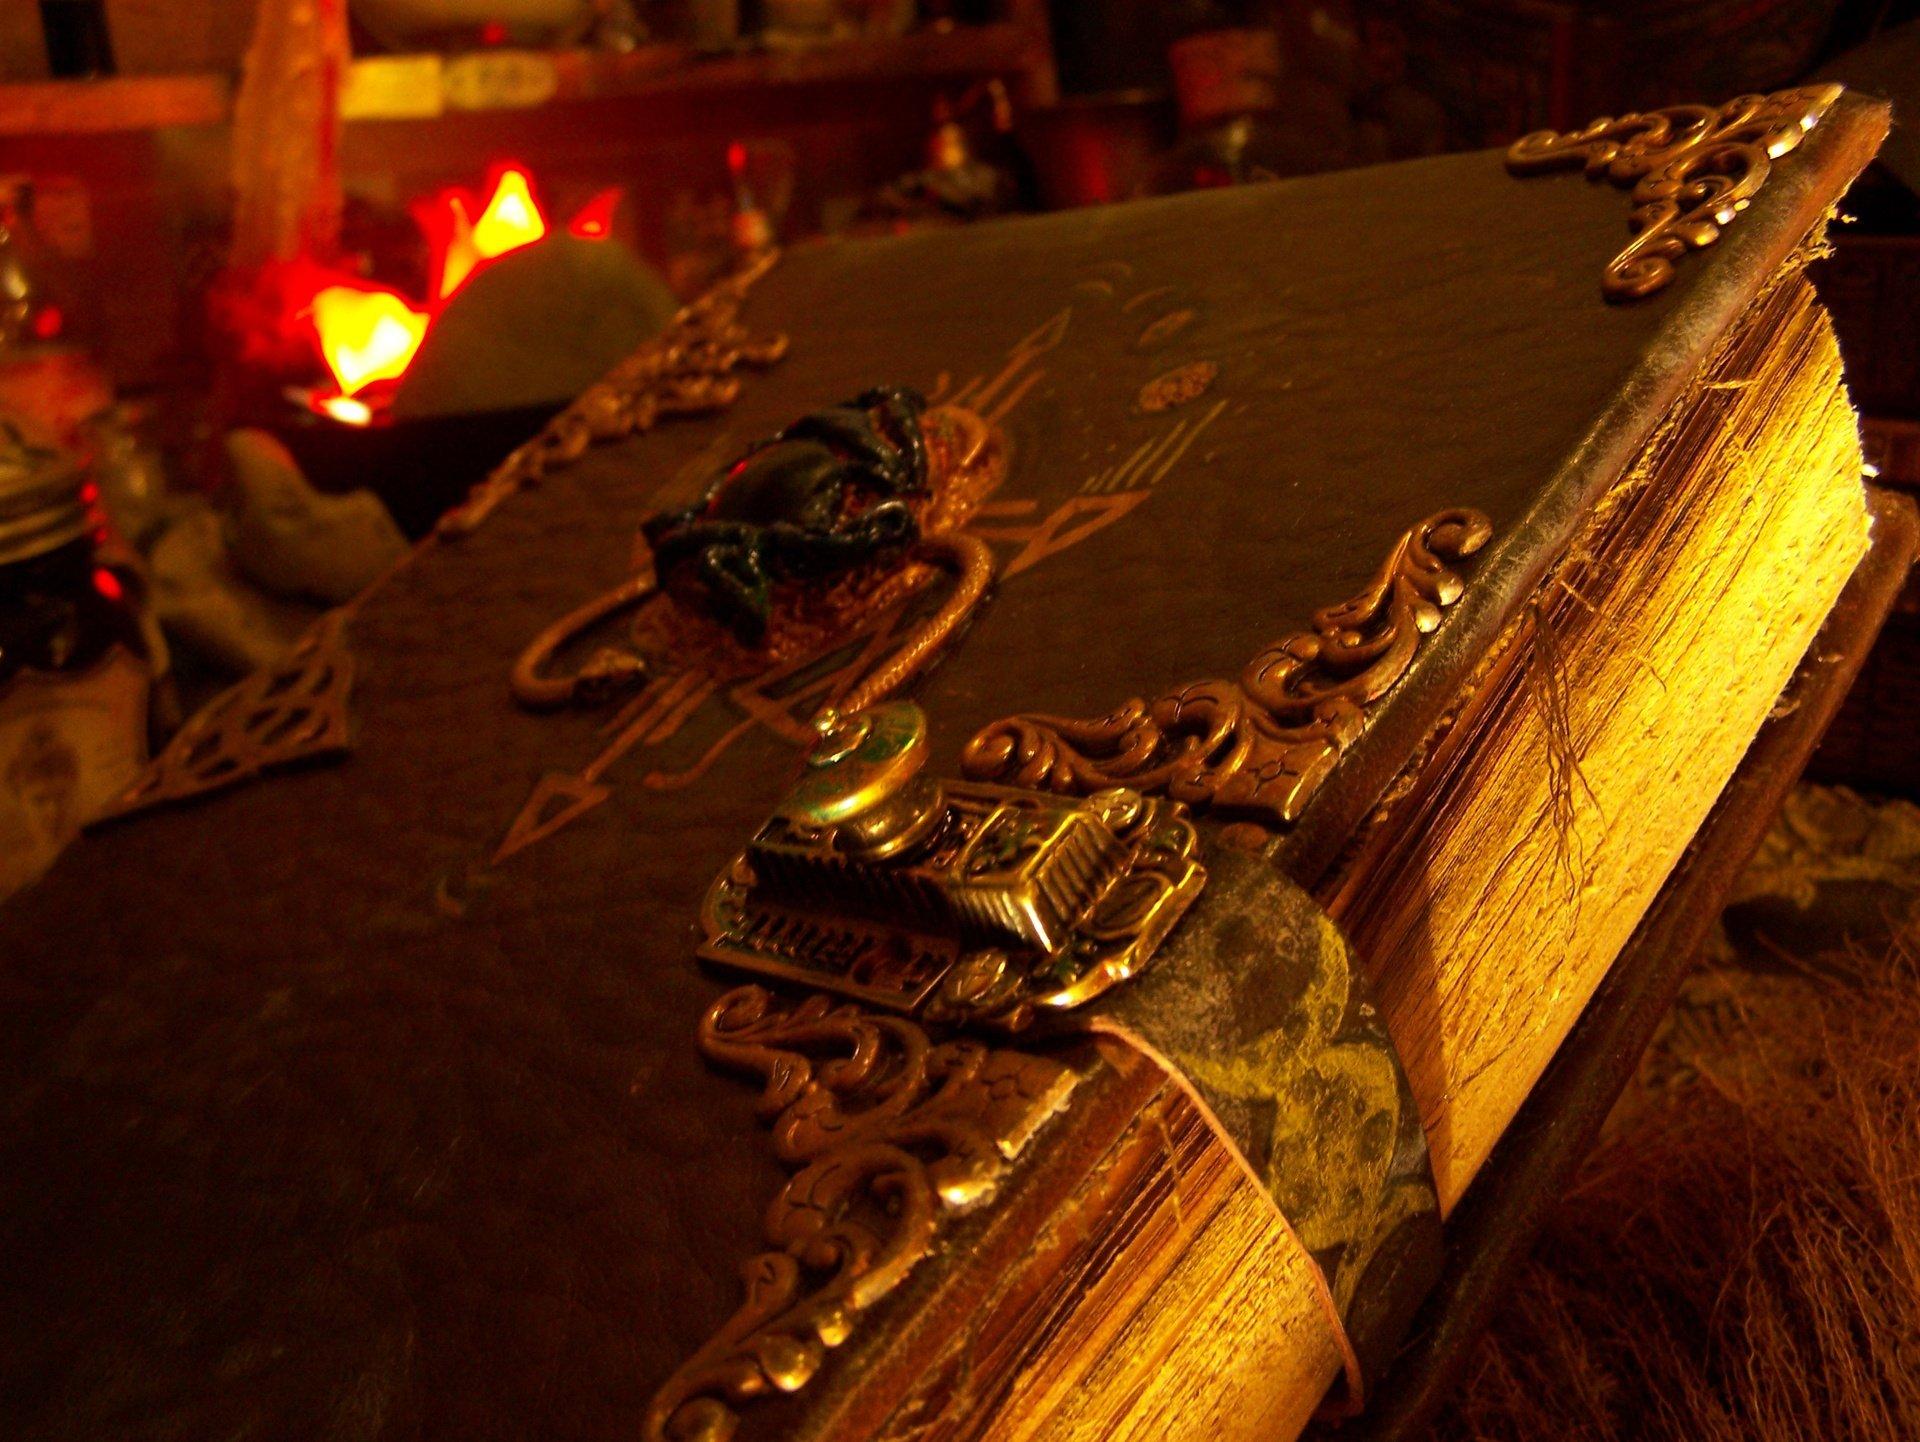 dark occult satanic bible fantasy book satan evil wallpaper background 1920x1442